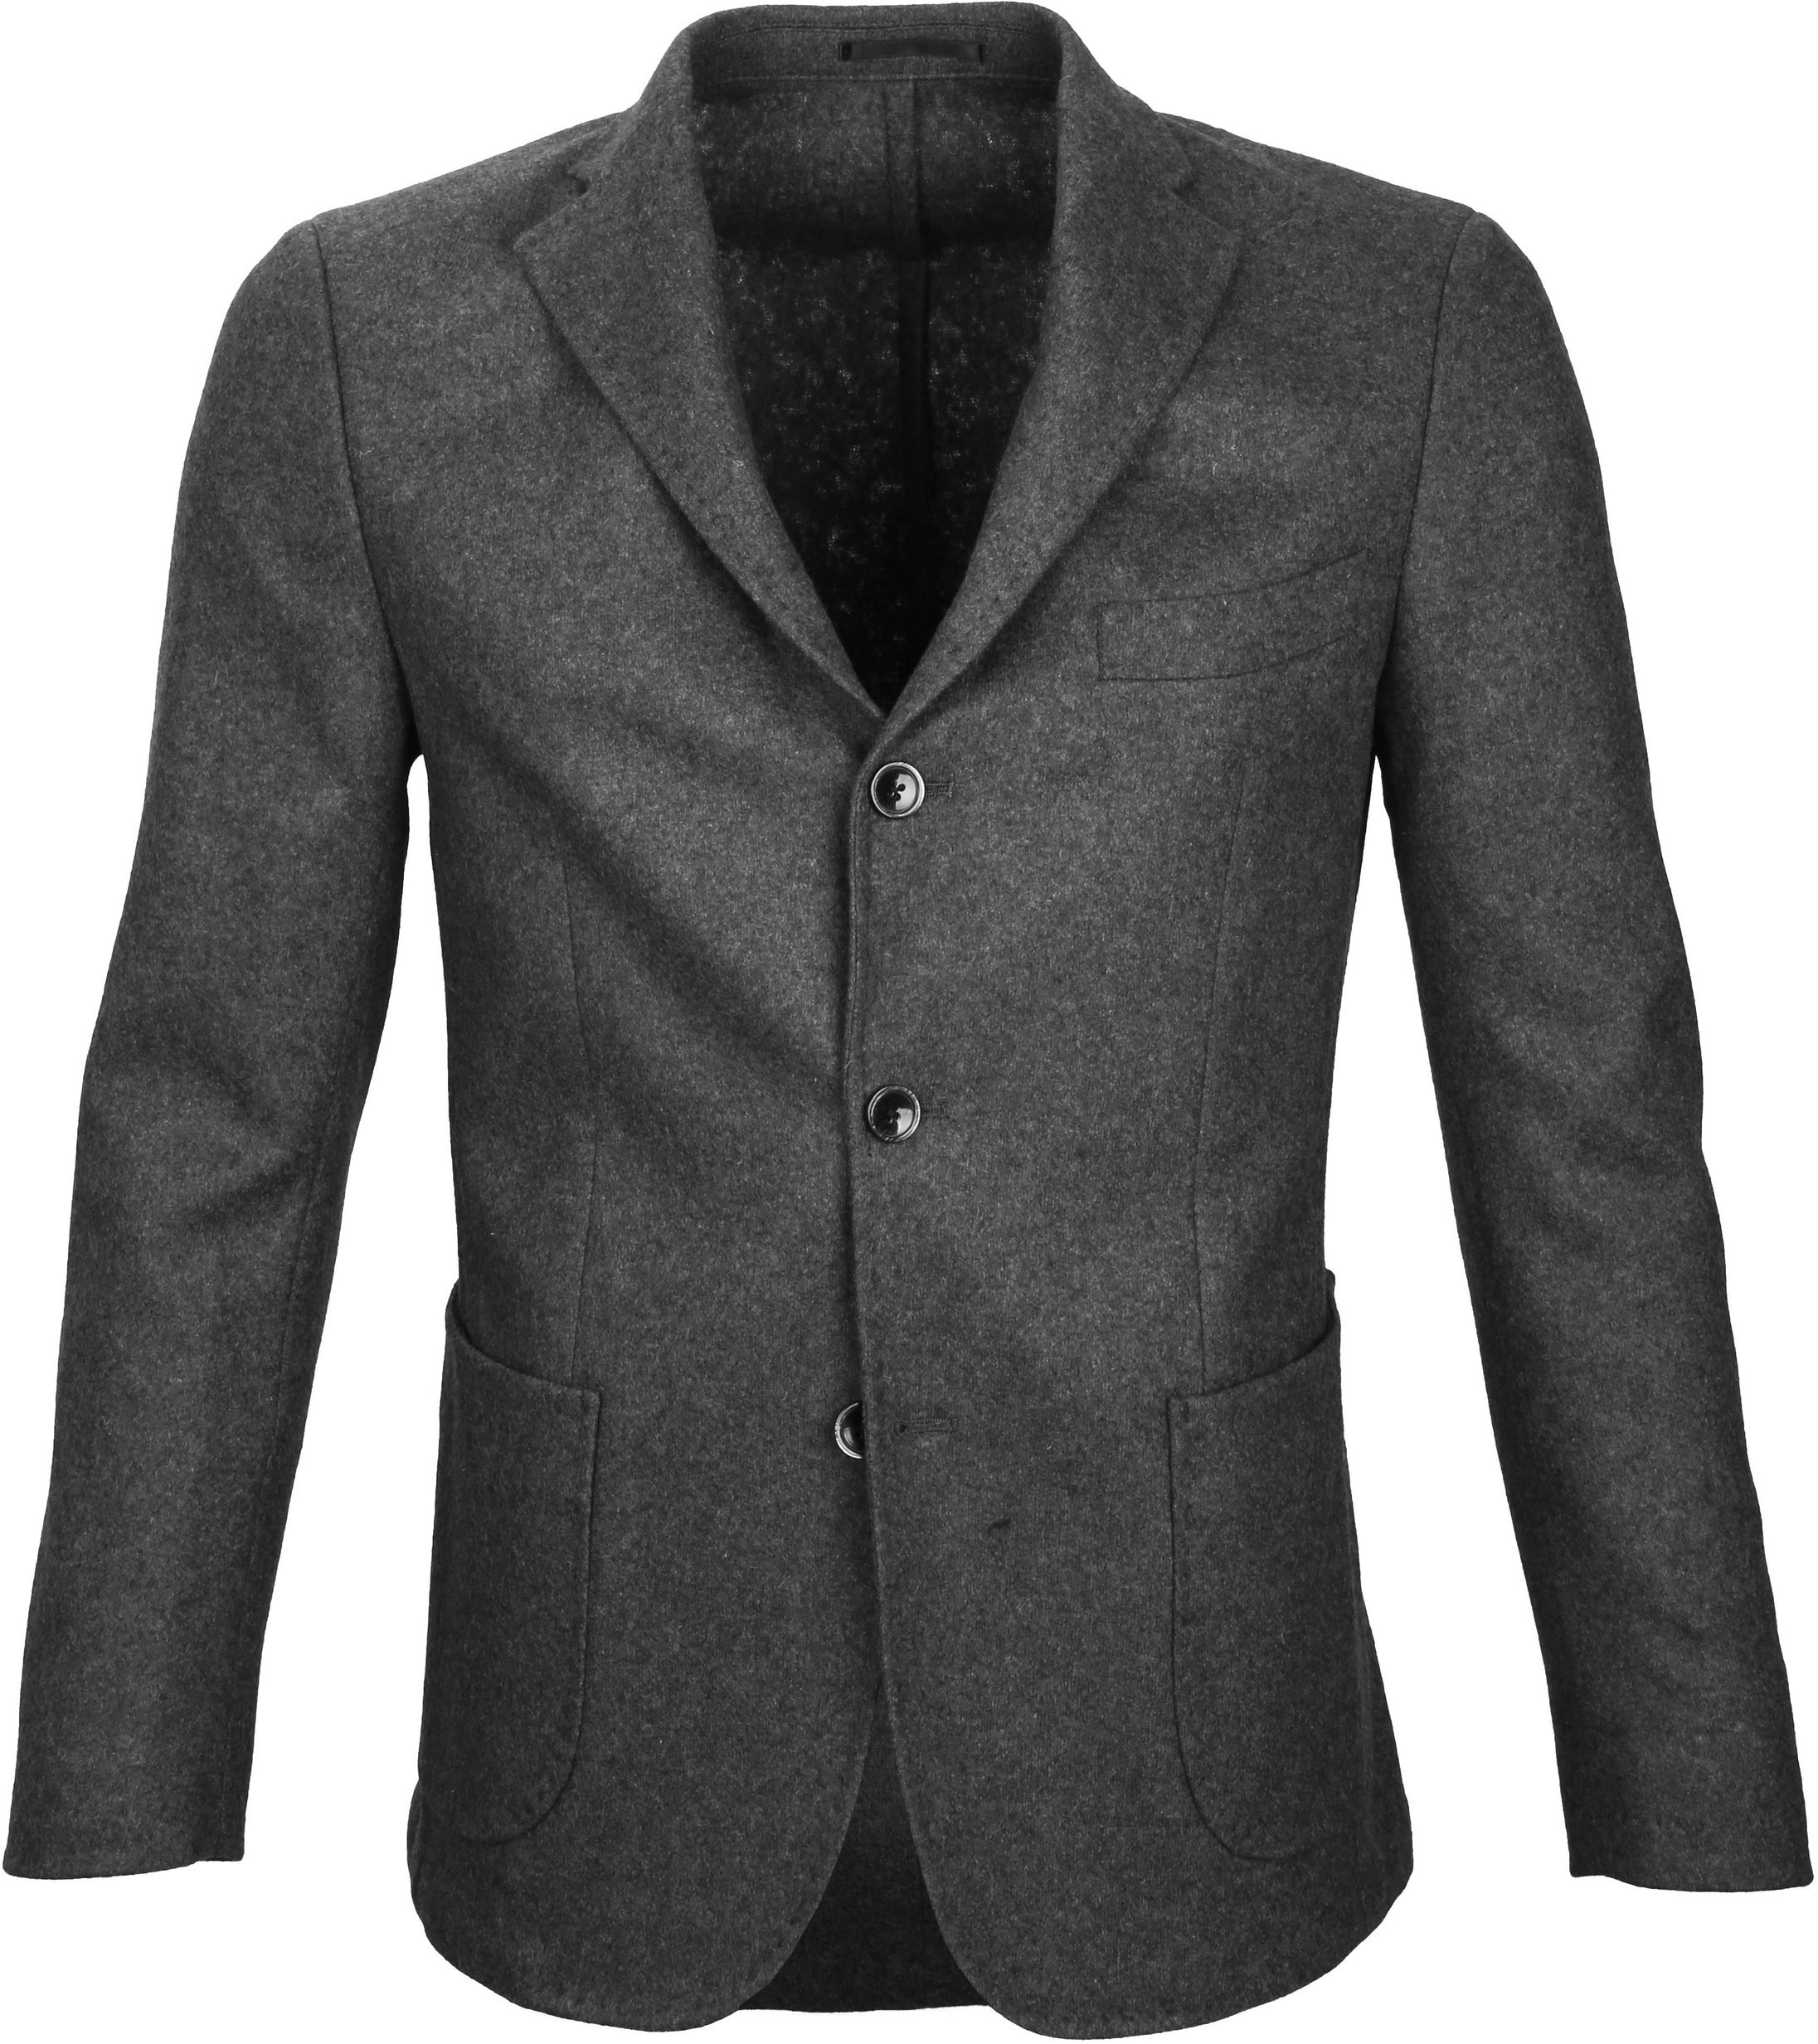 Suitable Blazer Easky Grau foto 0